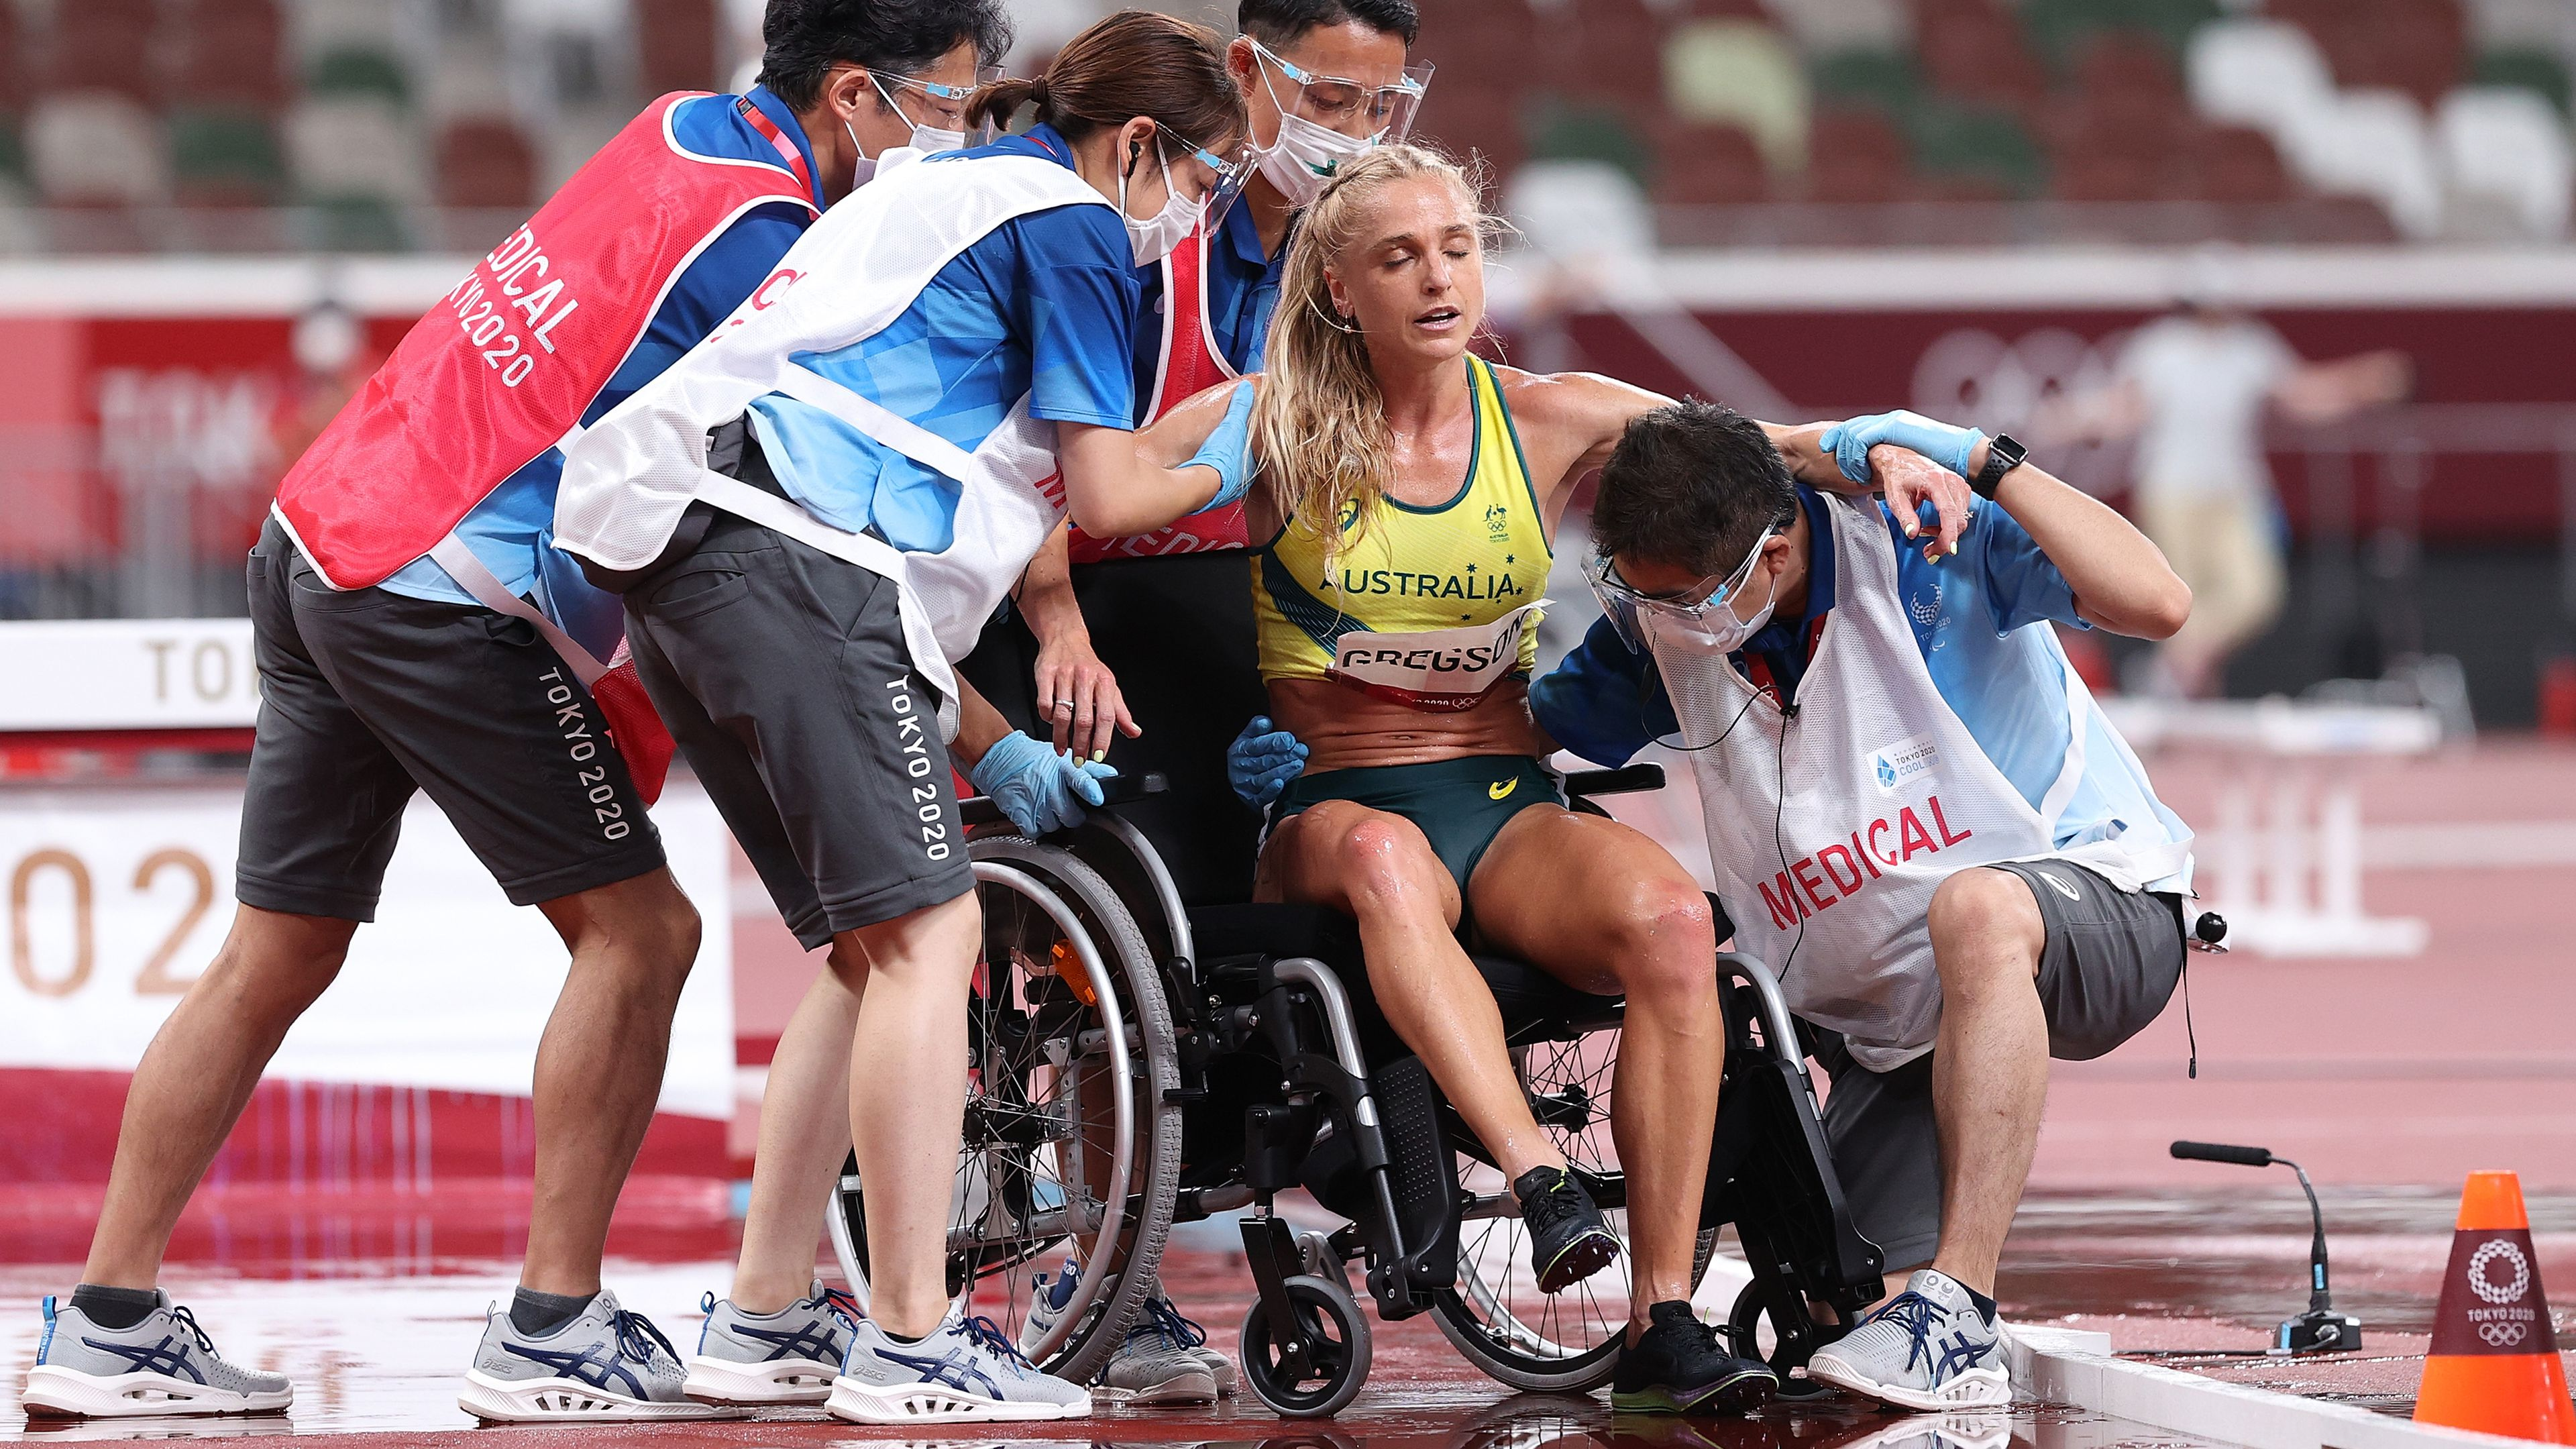 Tokyo 2021: Australia's Genevieve Gregson ruptures Achilles tendon in 3000m steeplechase